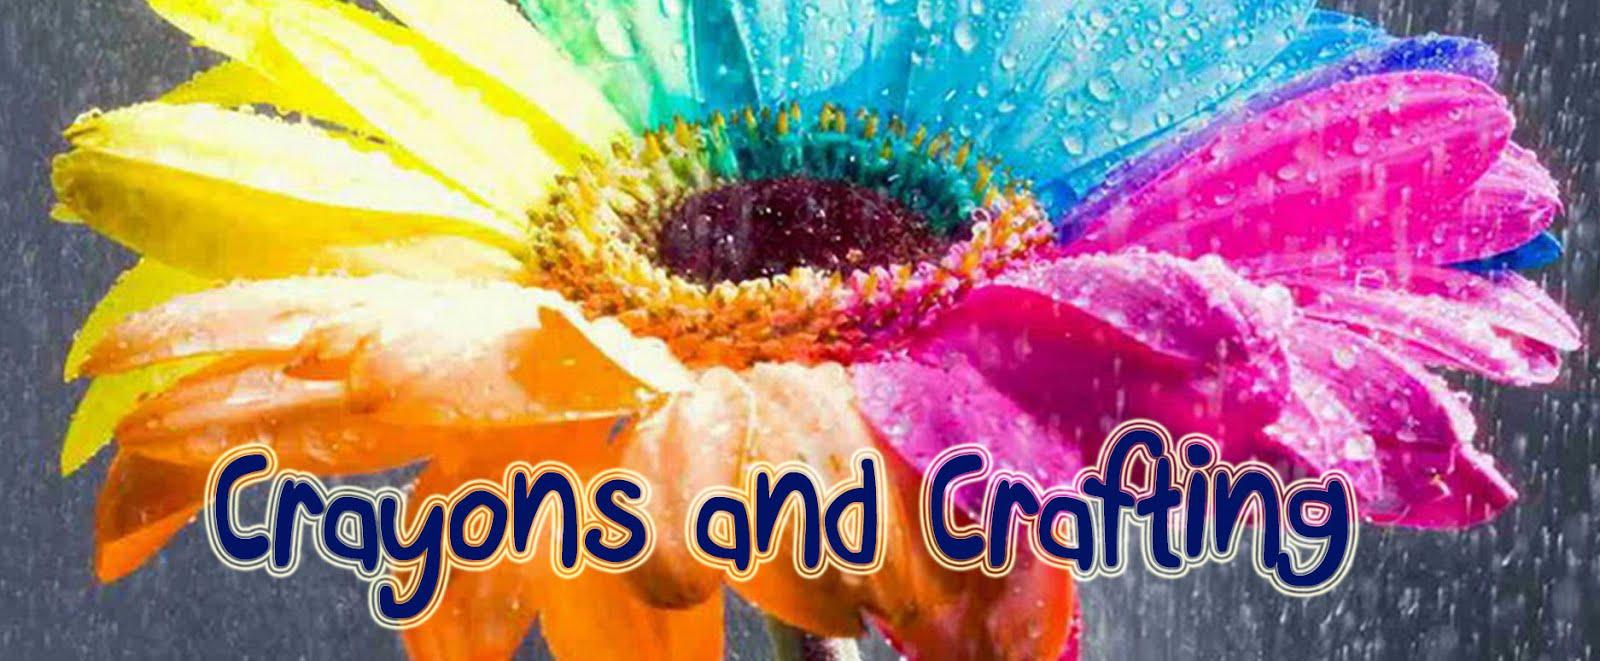 Crayons and Crafting